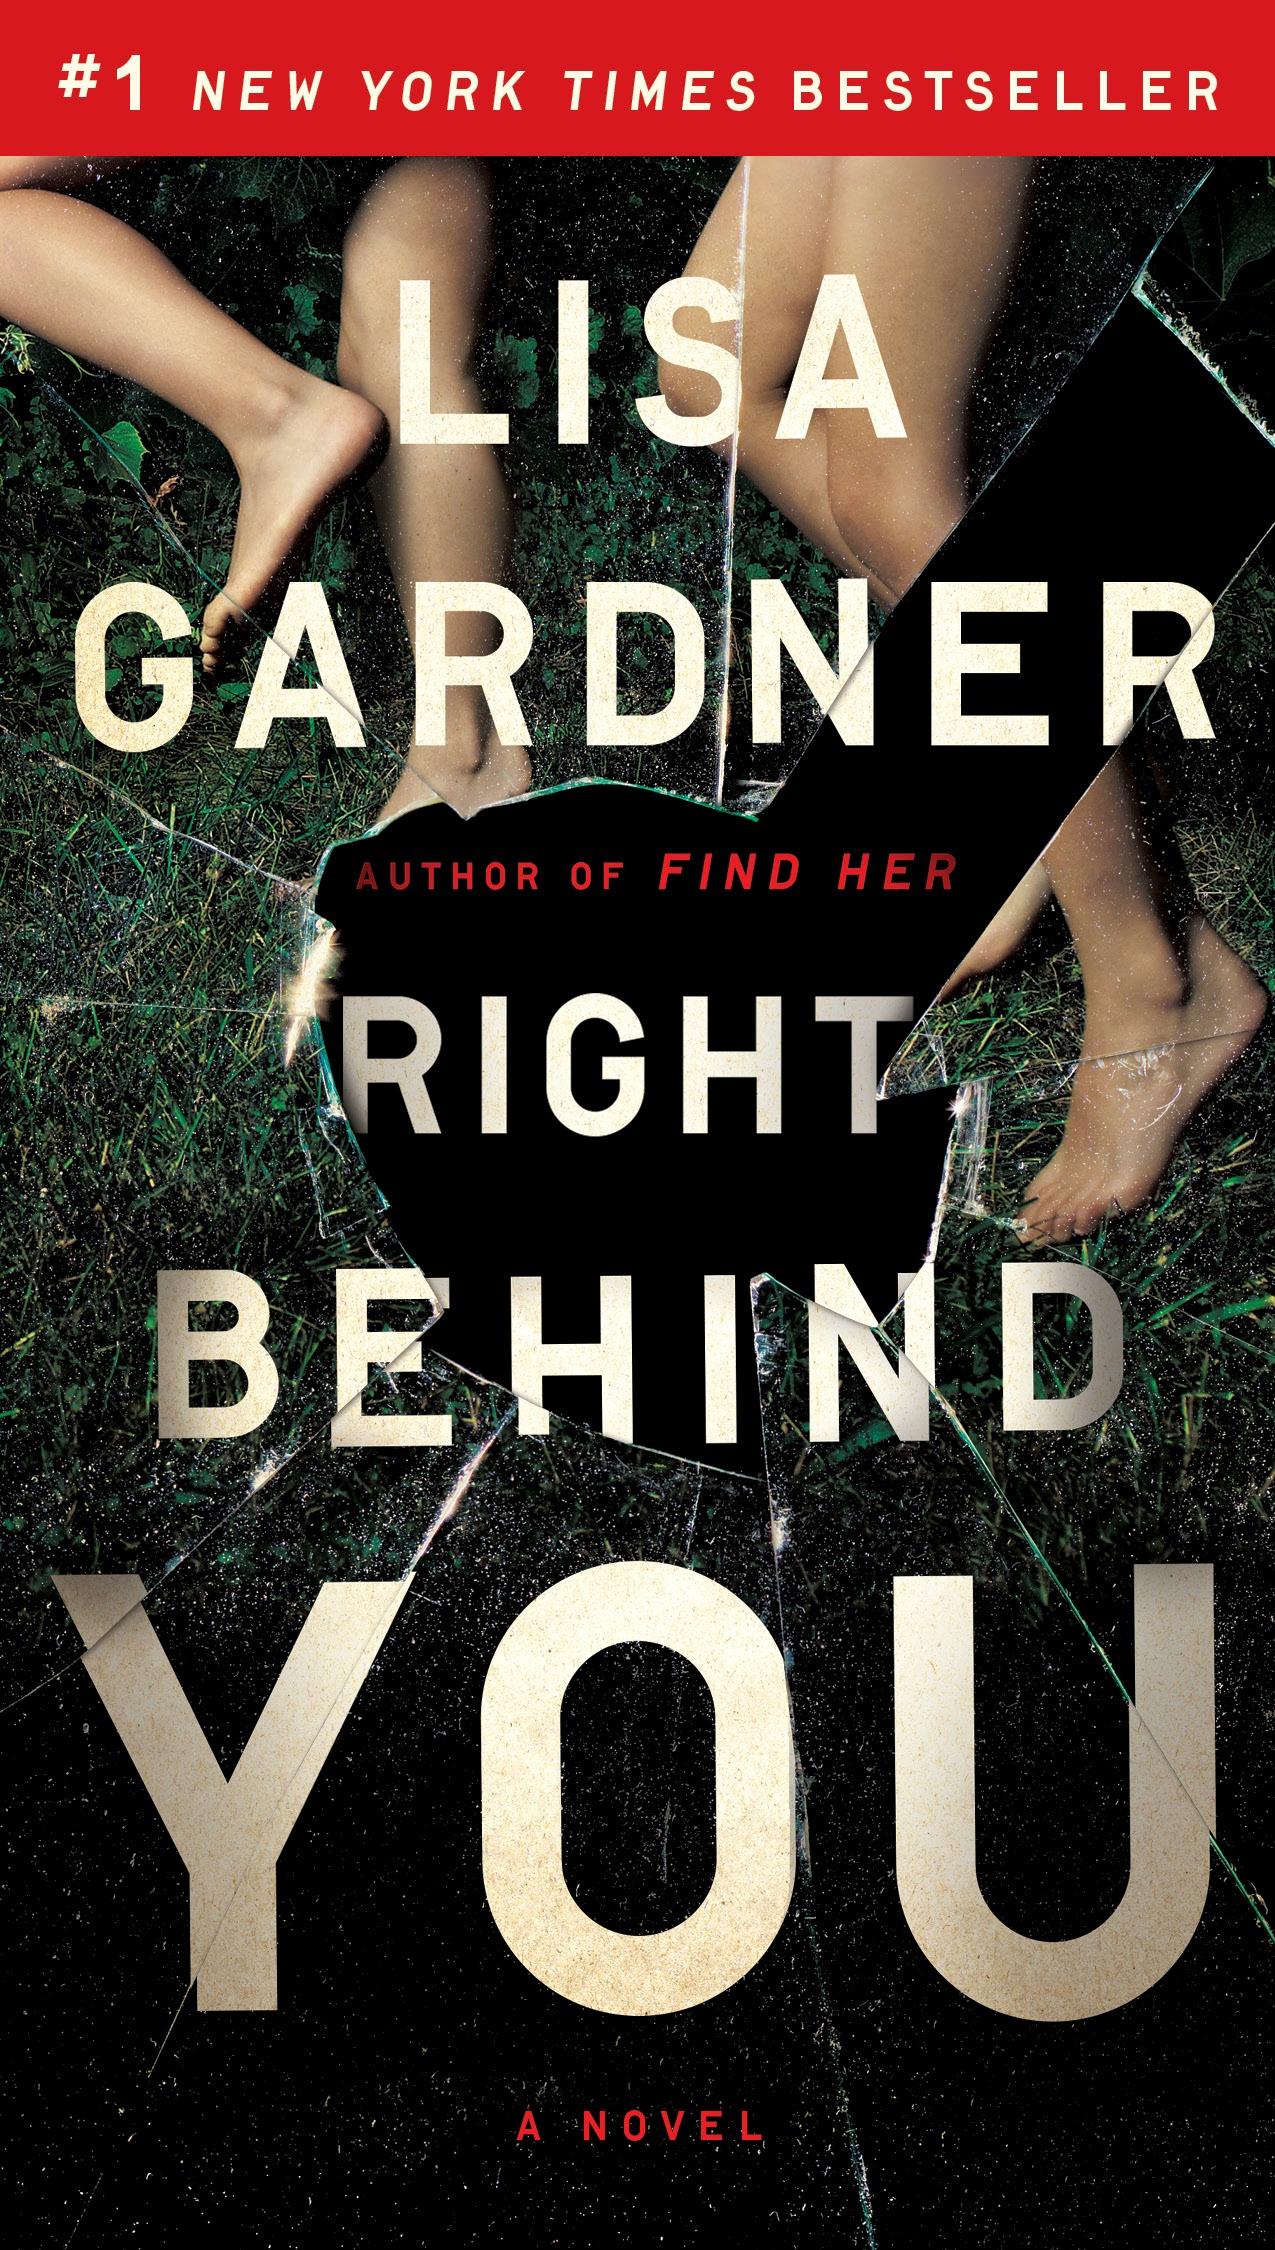 Lisa Gardner's Right Behind You out in Paperback–Series order for FBI Profiler series